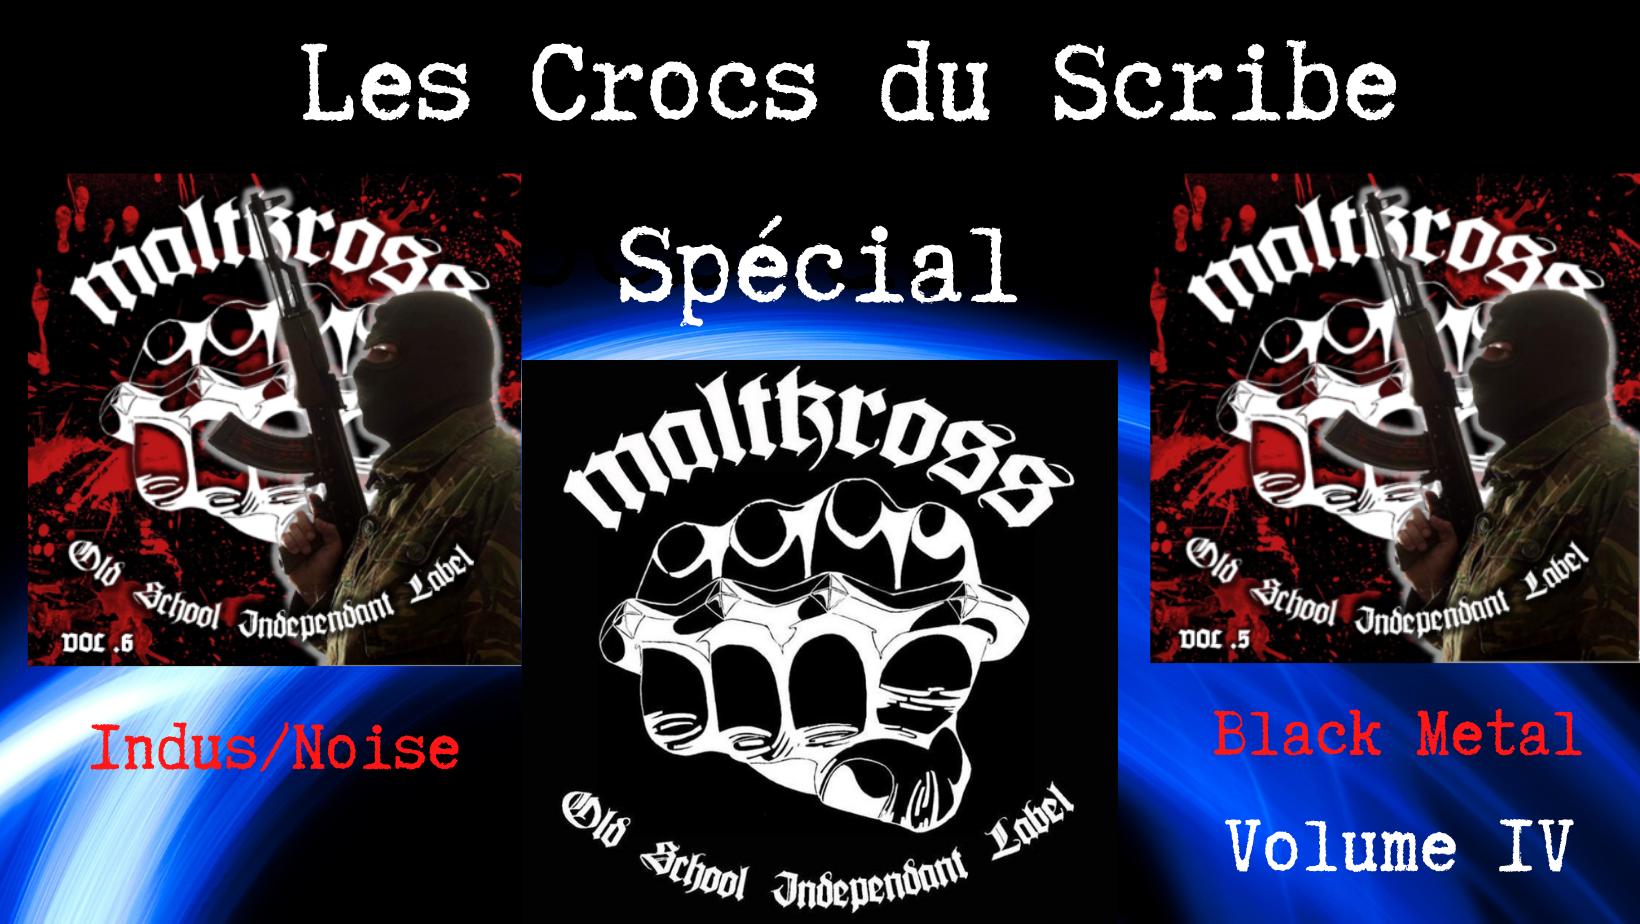 les crocs du Scribe Special Maltkross Avril 2021 le scribe du rock